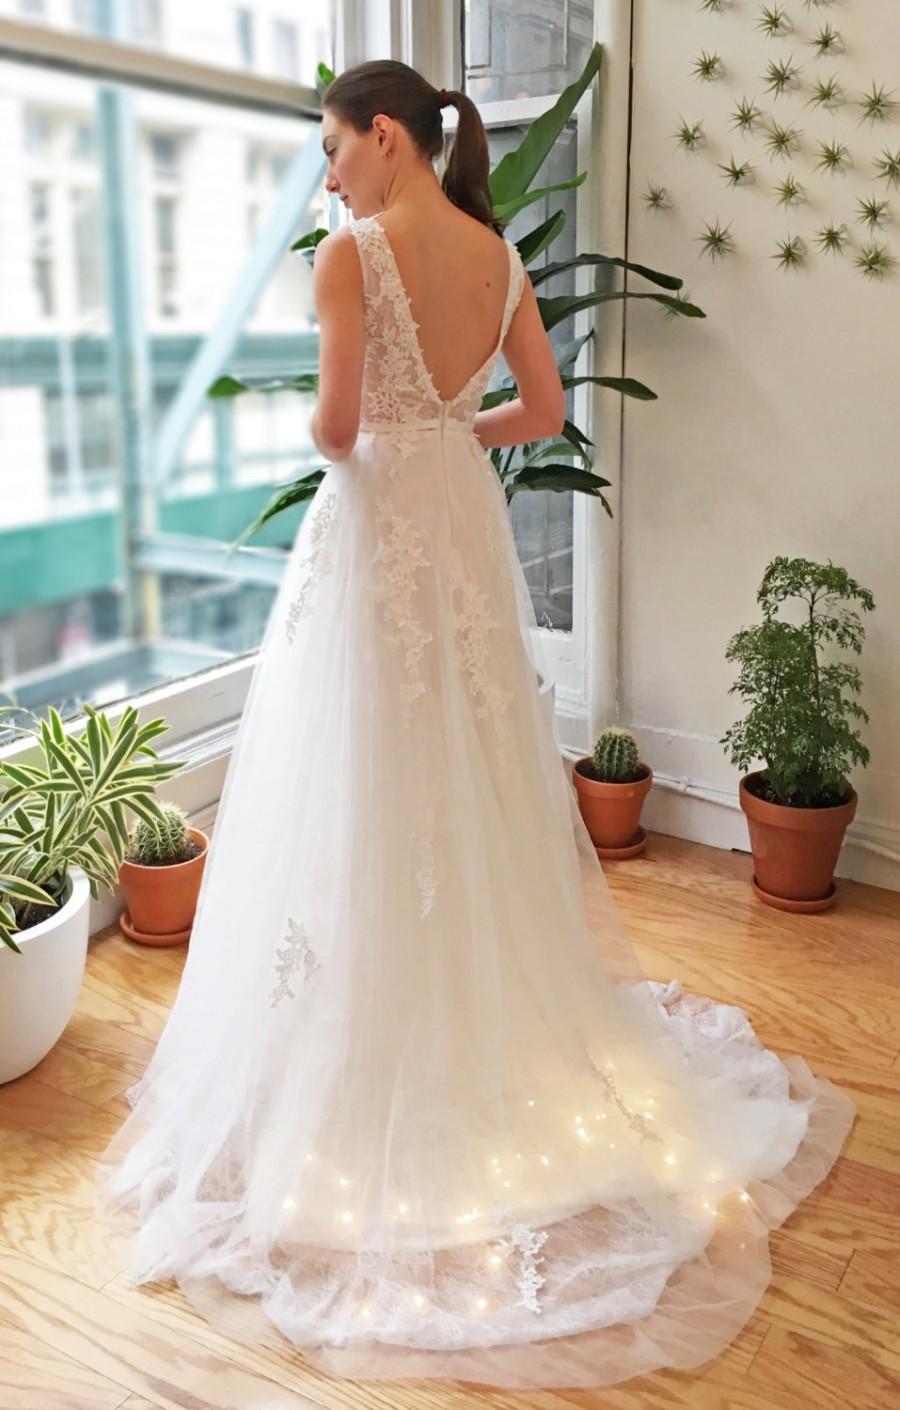 زفاف - White Deep V Back Lace Wedding Dress